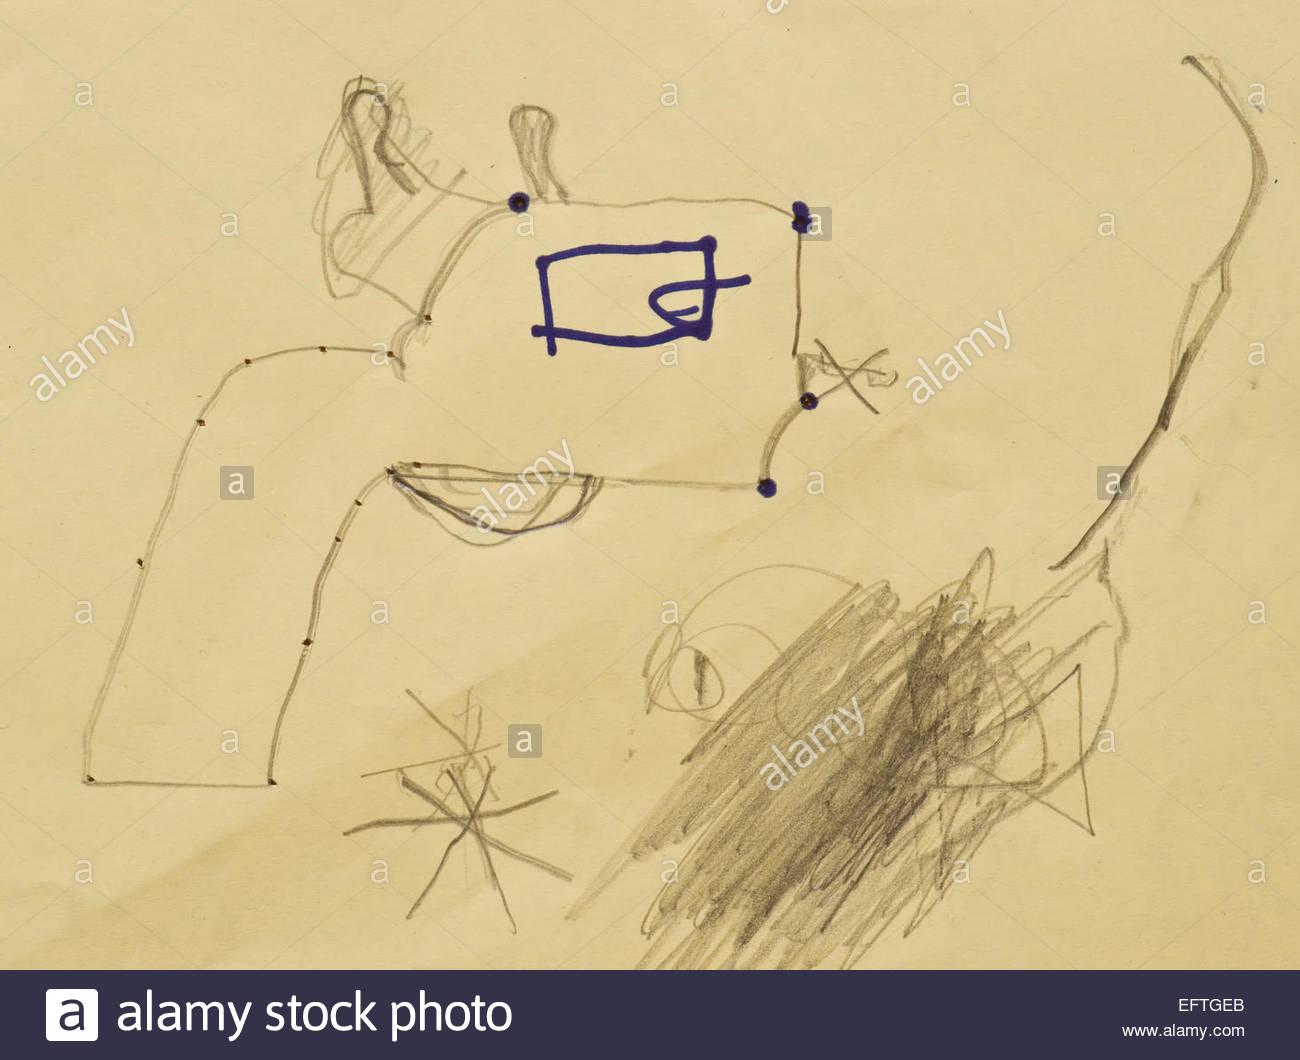 stock photo designing drawing paper gun design art artist artwork artwork artist art creativity childs childrens kid kids toy nobody single - Drawing Paper For Kids